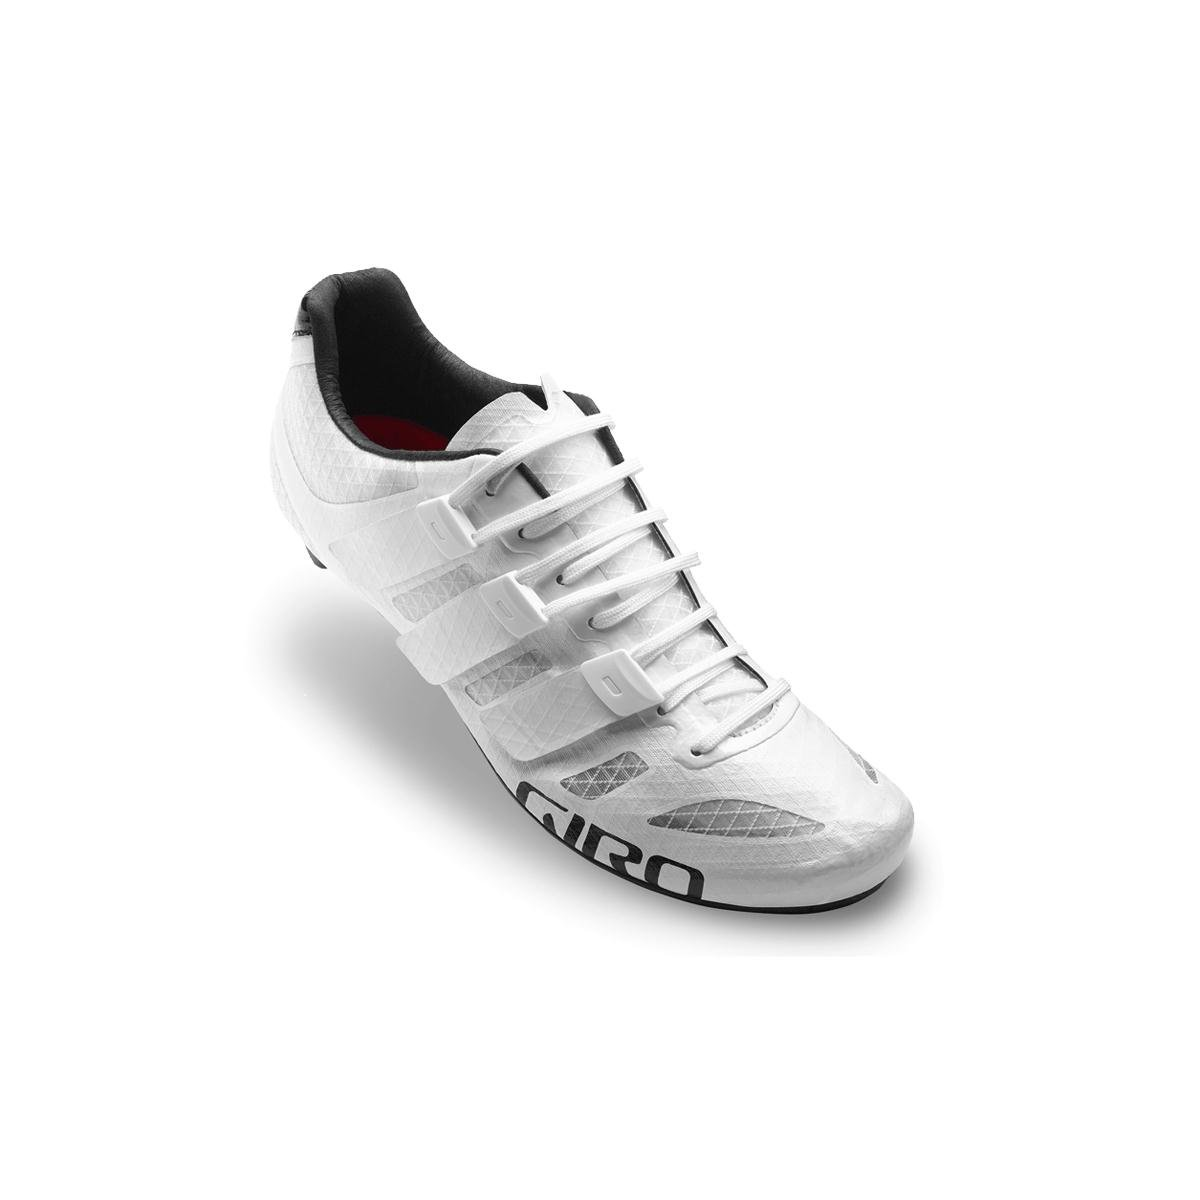 Giro 2017 Prolight techlaceロードサイクリング靴 – ホワイト/ブラック 39 ホワイト/ブラック B073RLHP4B